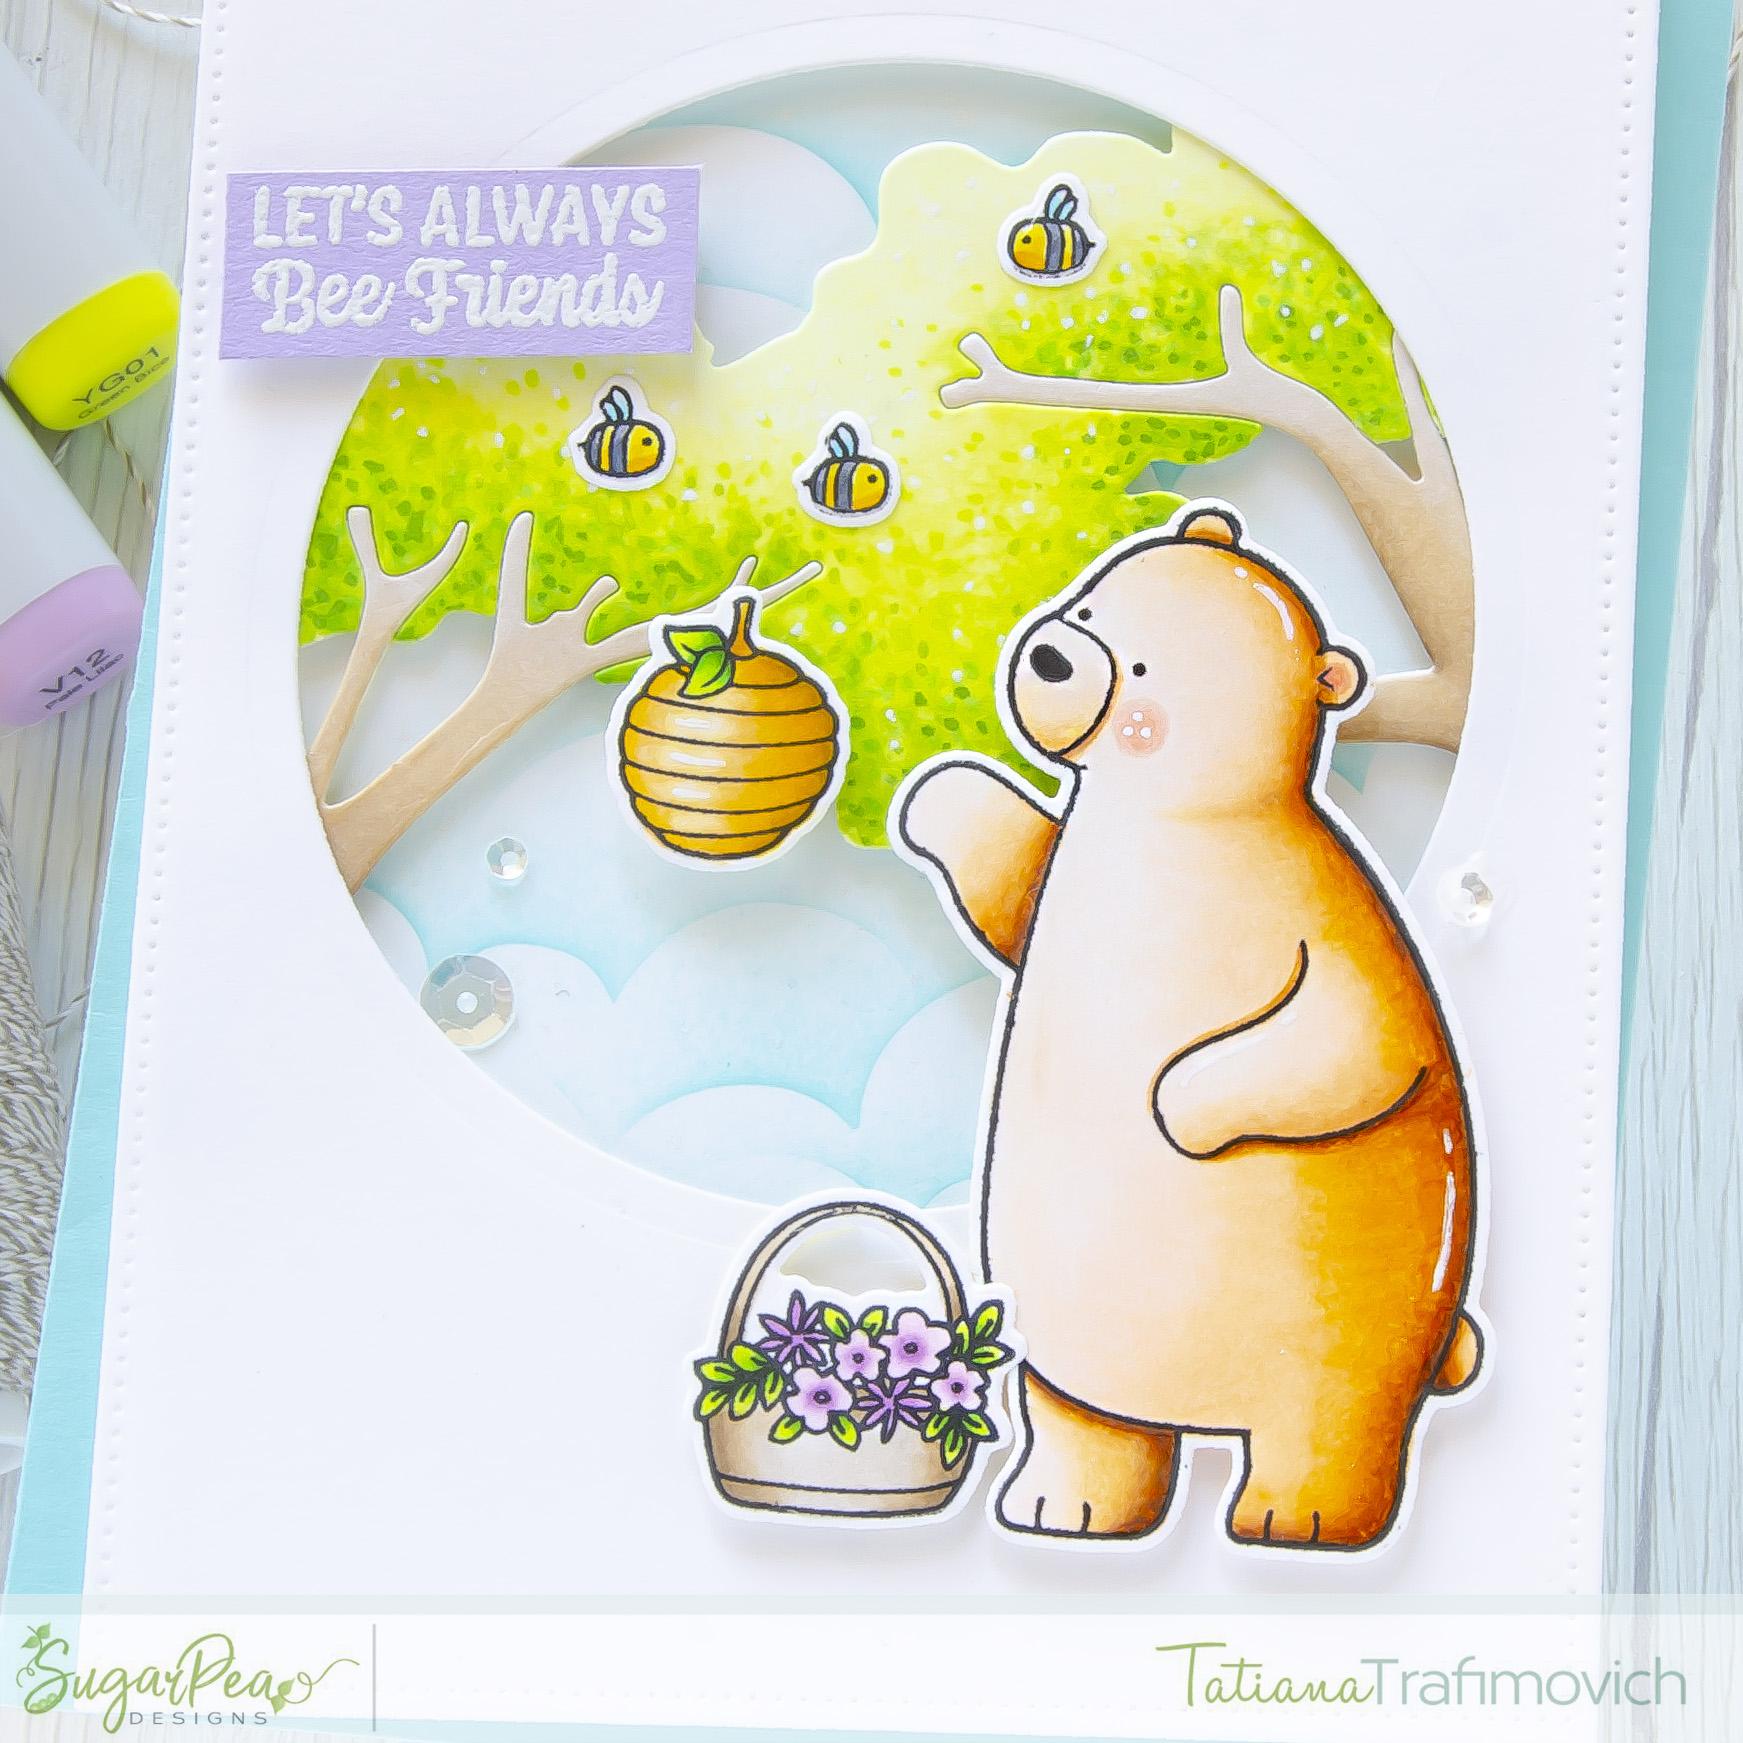 Let's Always Bee Friends #handmade card by Tatiana Trafimovich #tatianacraftandart - Hey Spring stamp set by SugarPea Designs #sugarpeadesigns